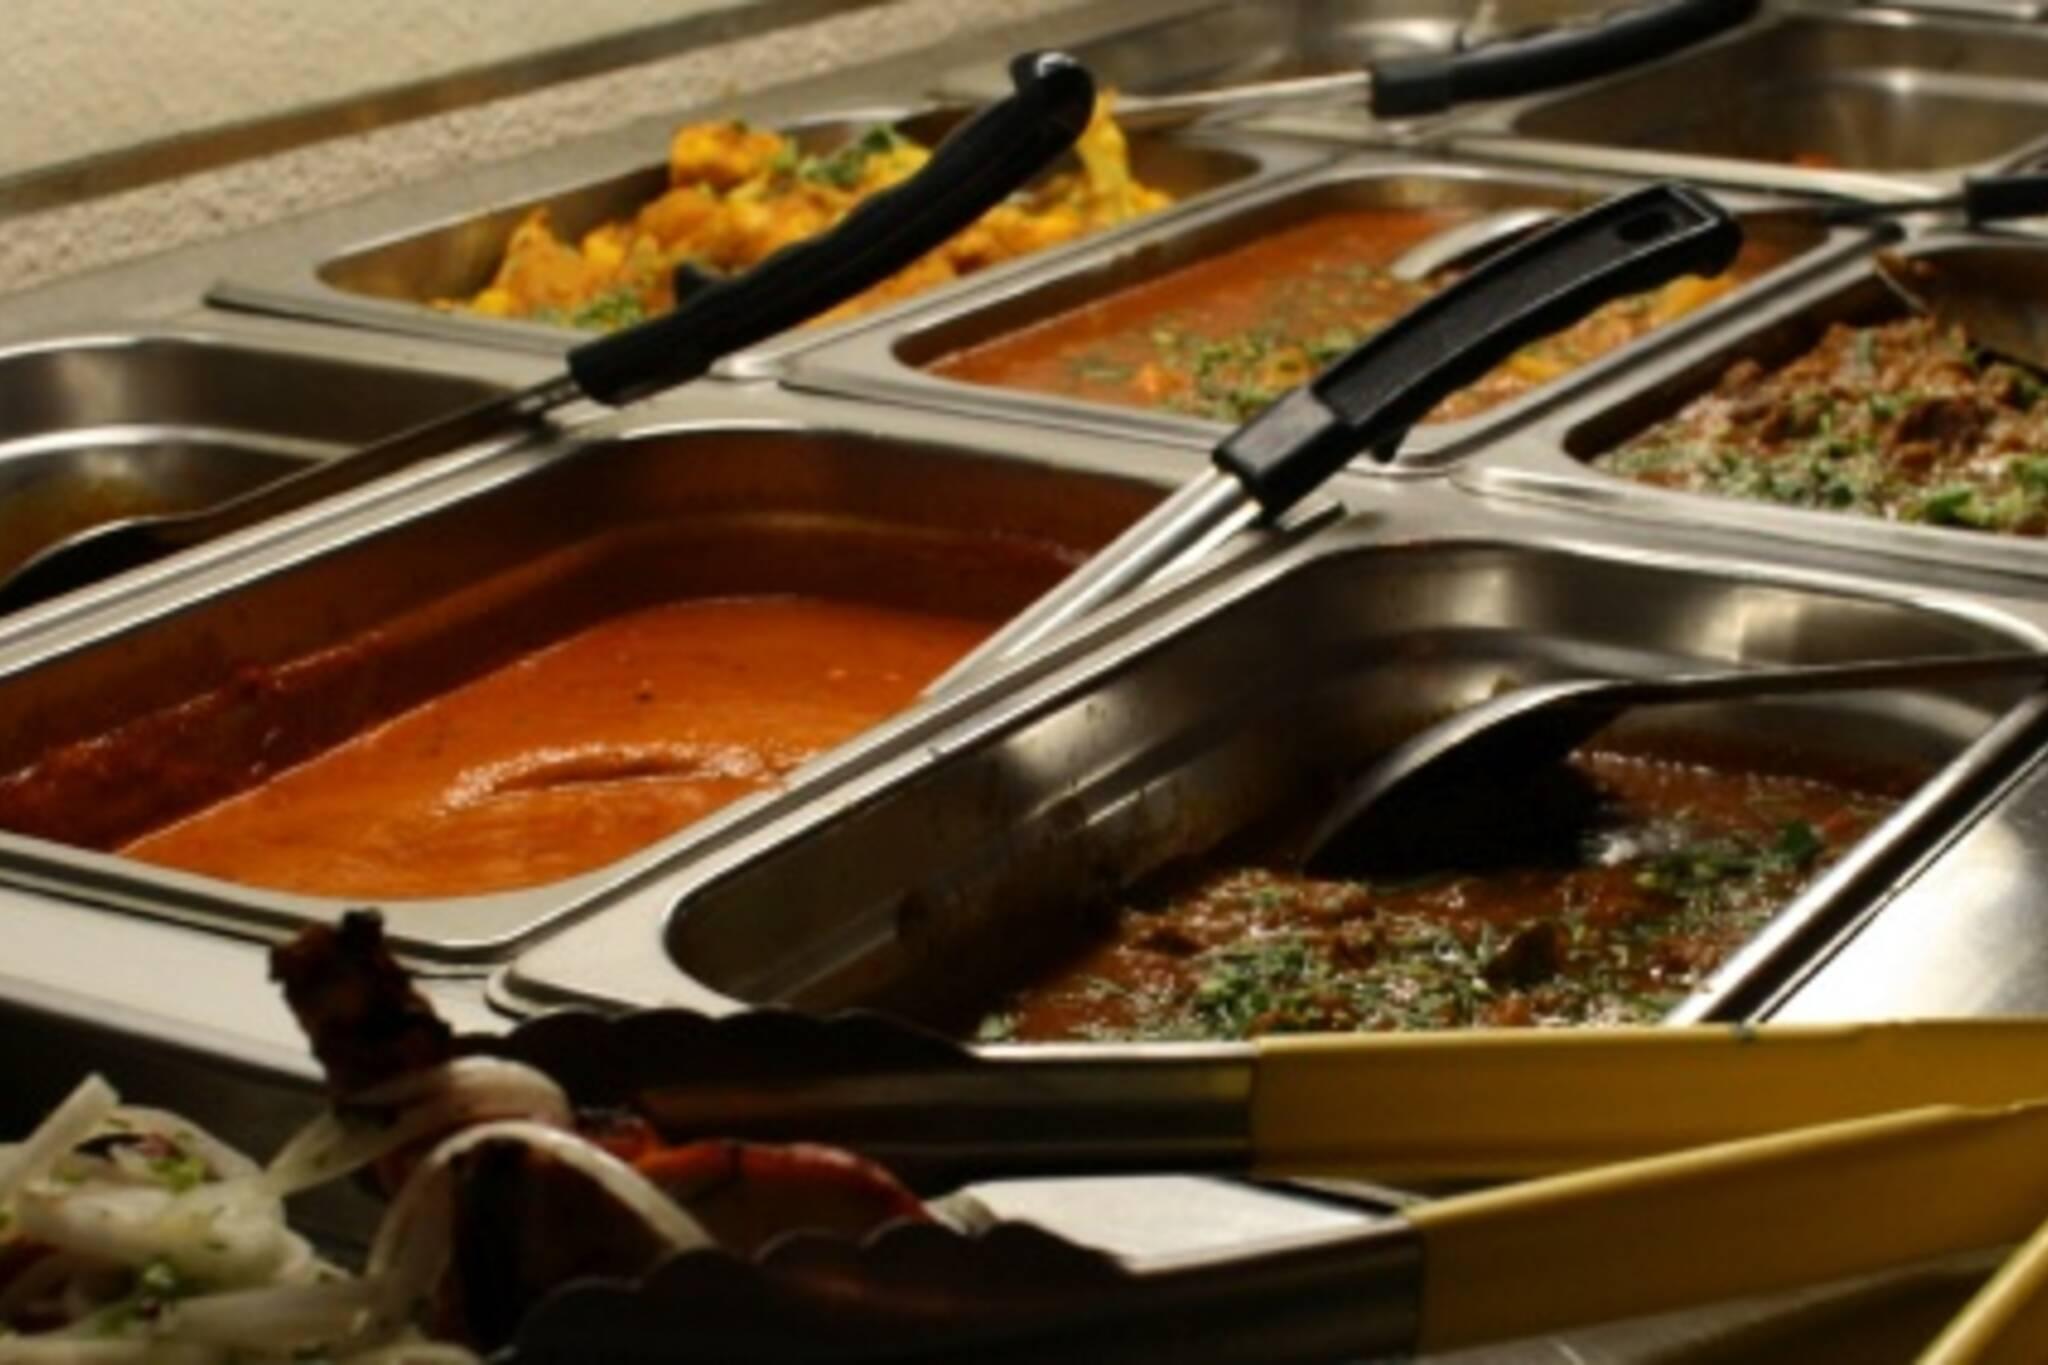 Agra fine indian cuisine blogto for Agra fine indian cuisine reviews